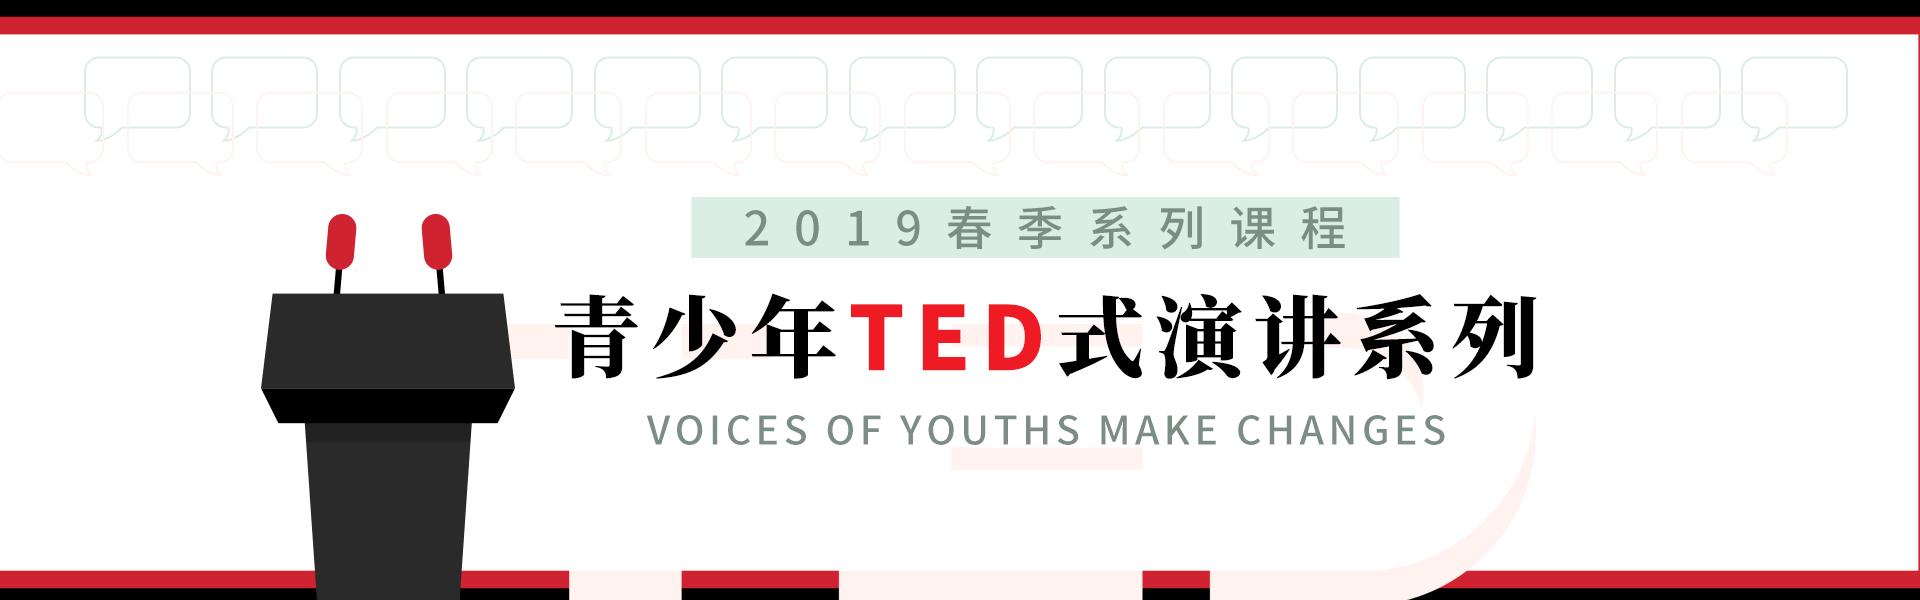 TED式演讲